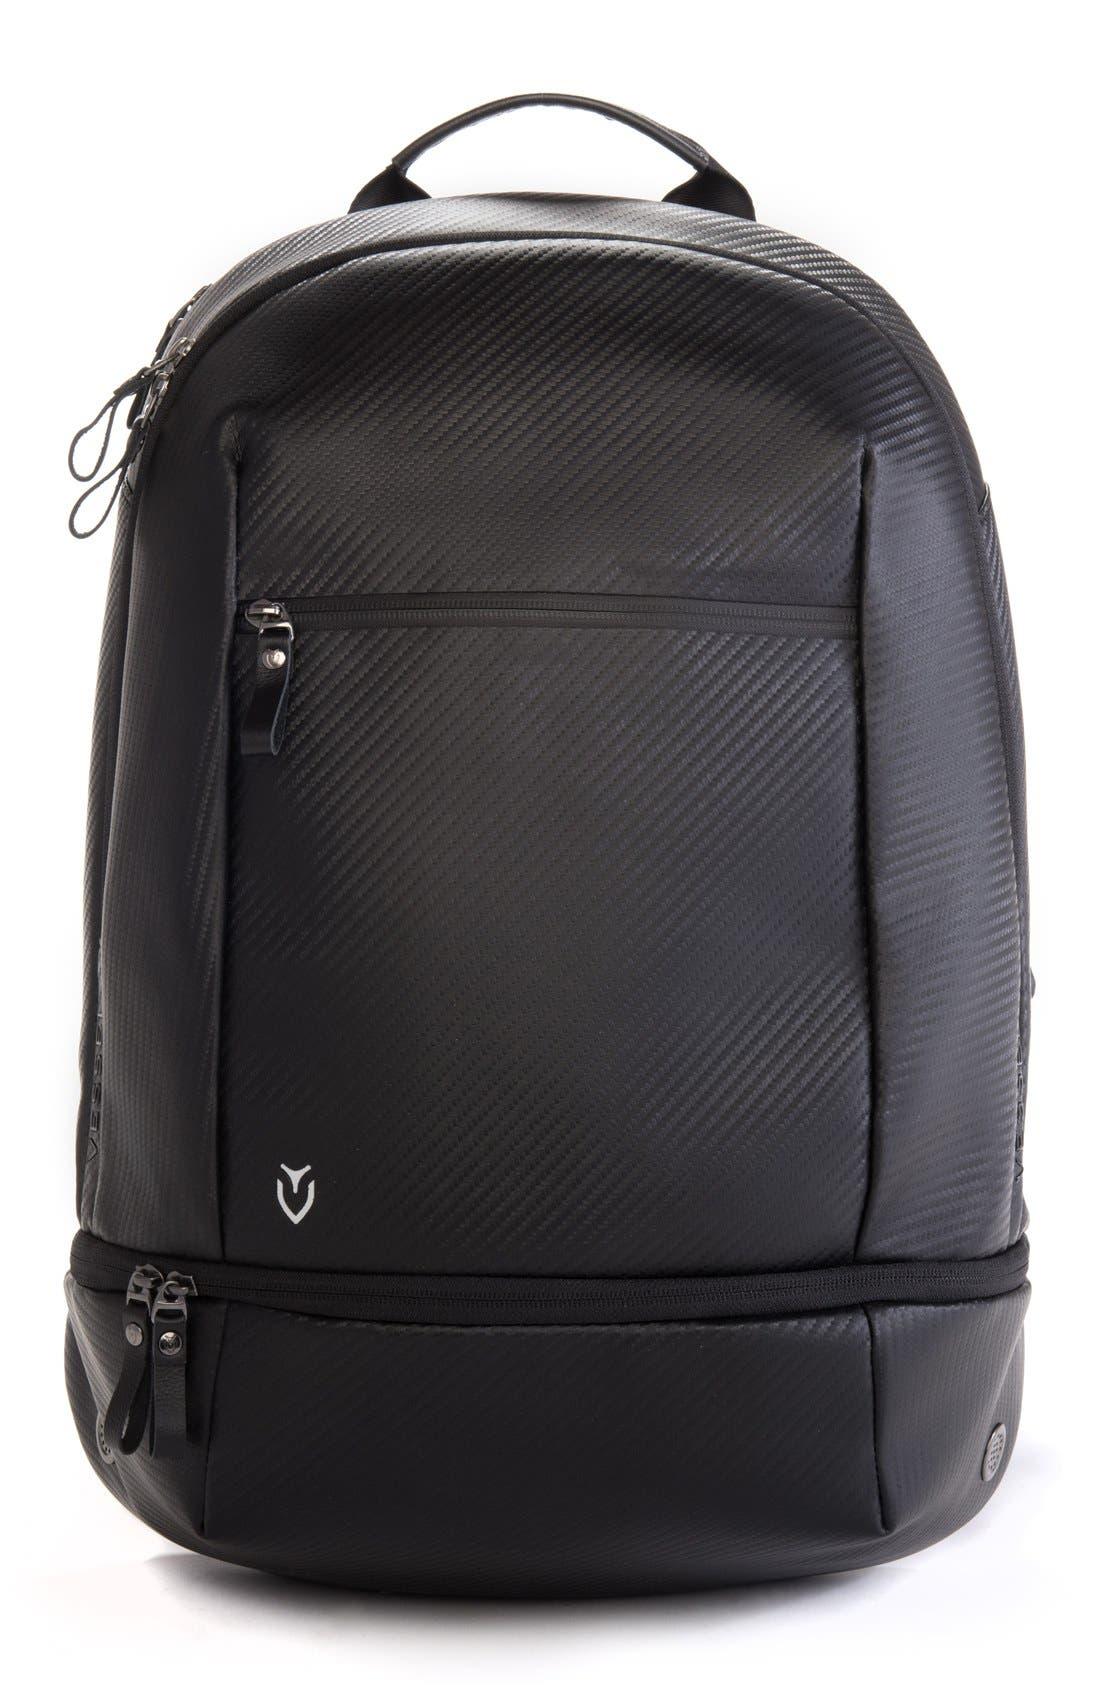 Alternate Image 1 Selected - Vessel 'Signature' Backpack